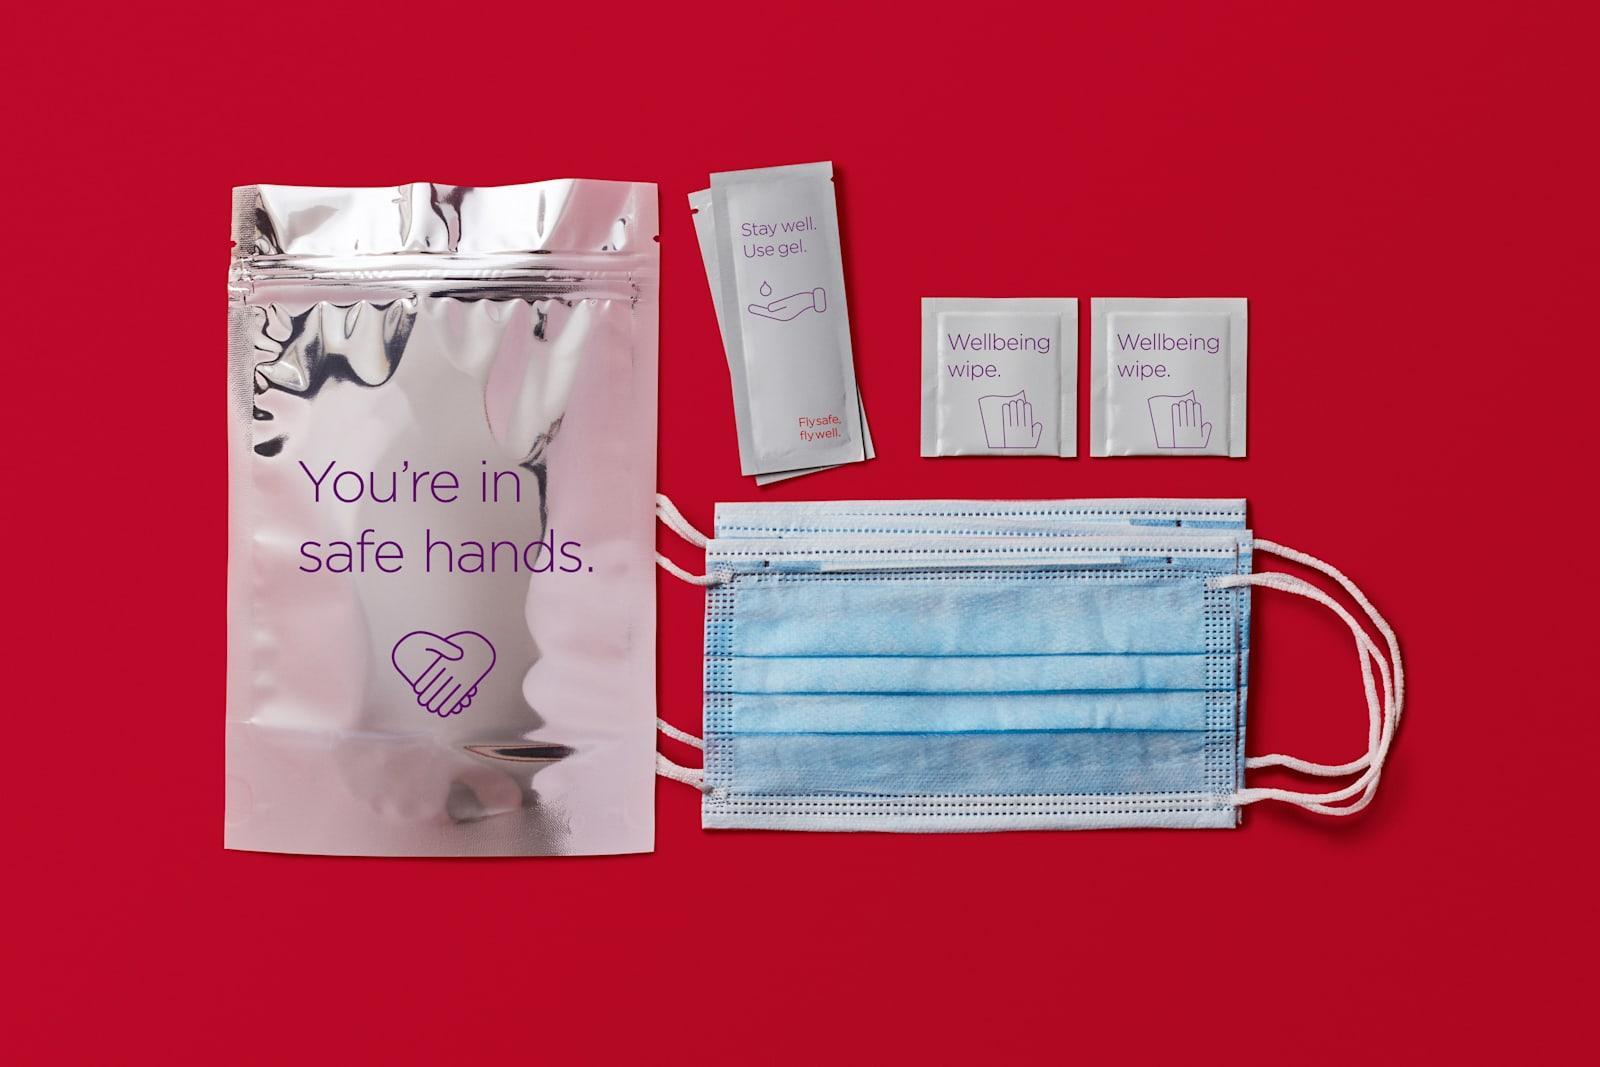 Virgin Atlantic's health pack for customers